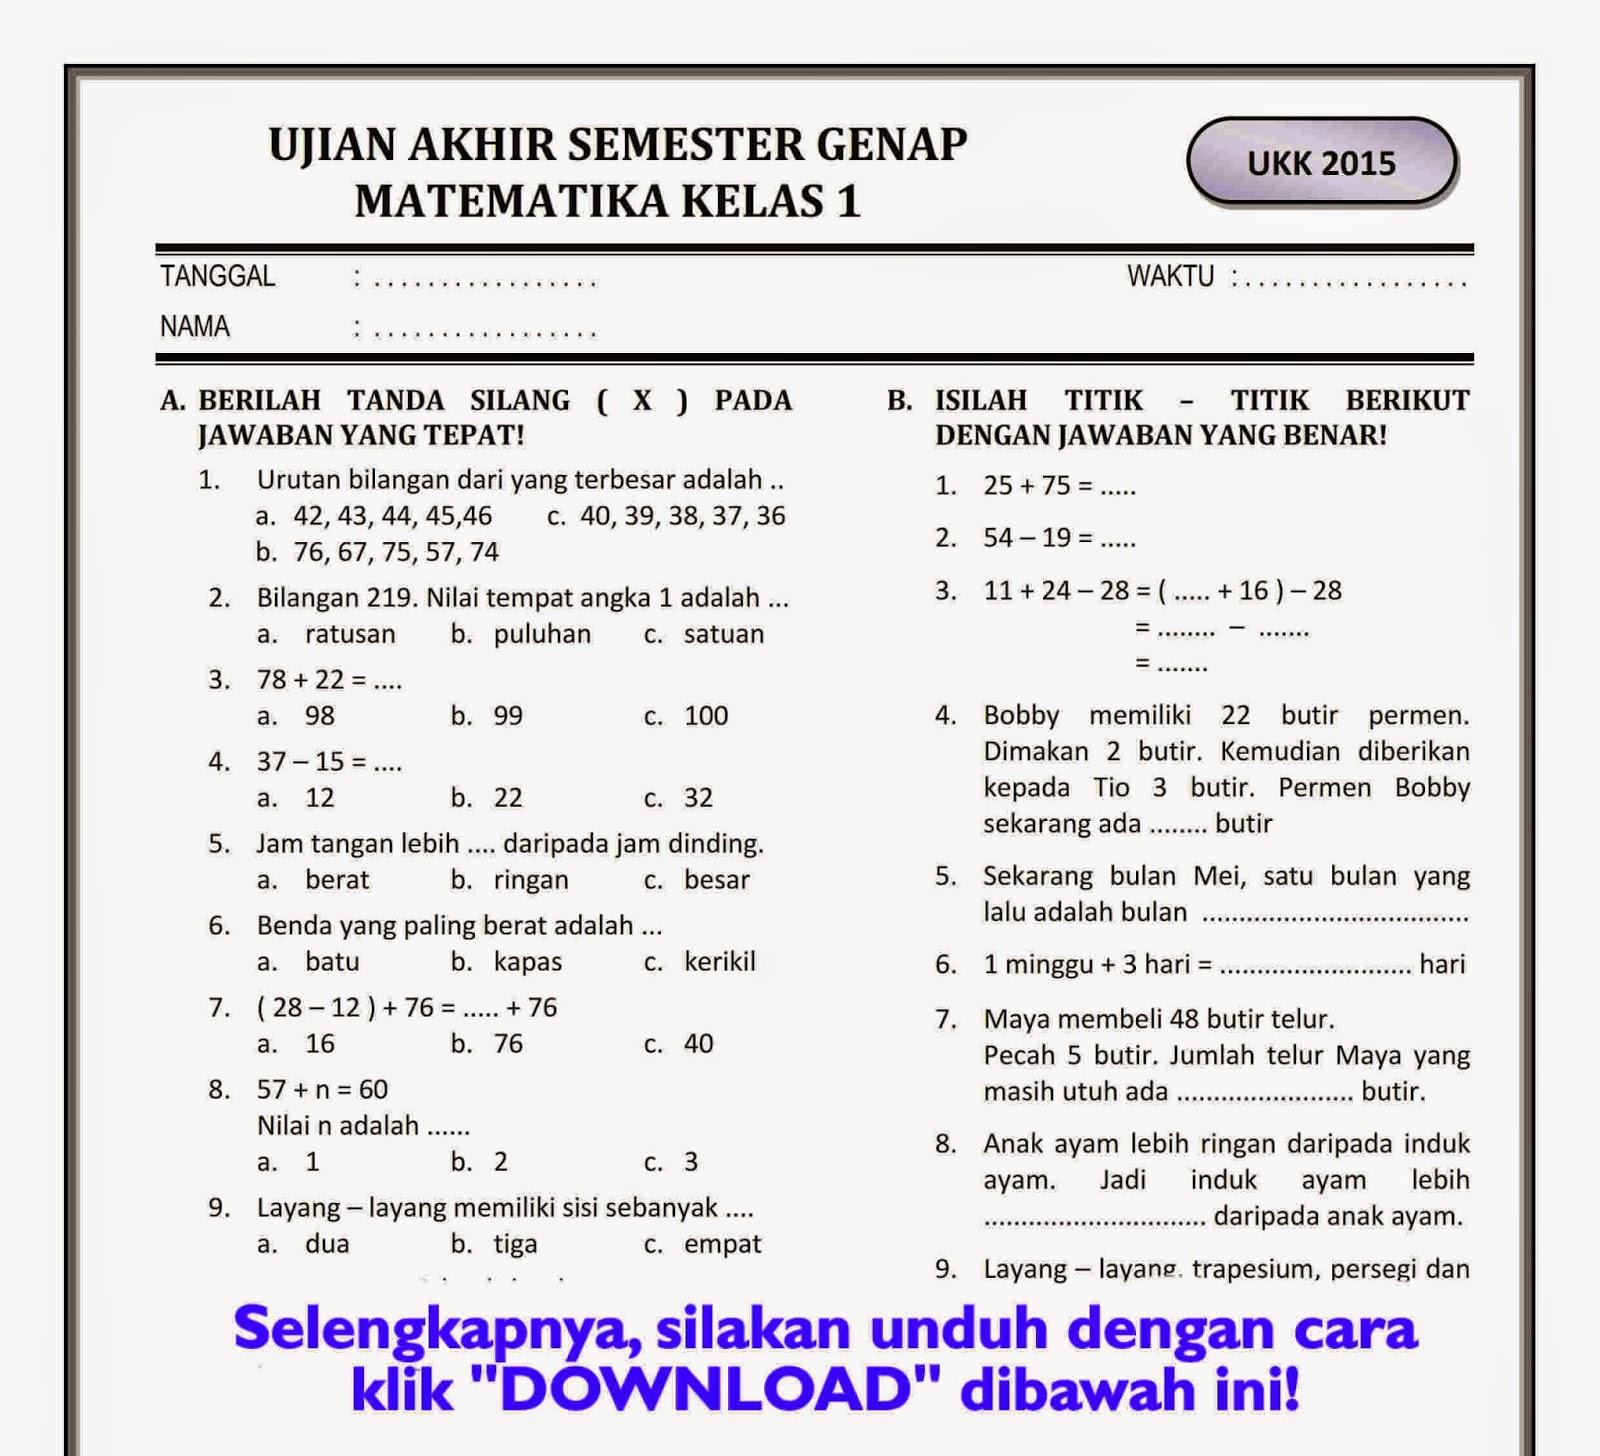 Download Soal UKK Matematika Kelas 1 Semester Genap ~ Rief Awa Blog : Download Kumpulan Soal